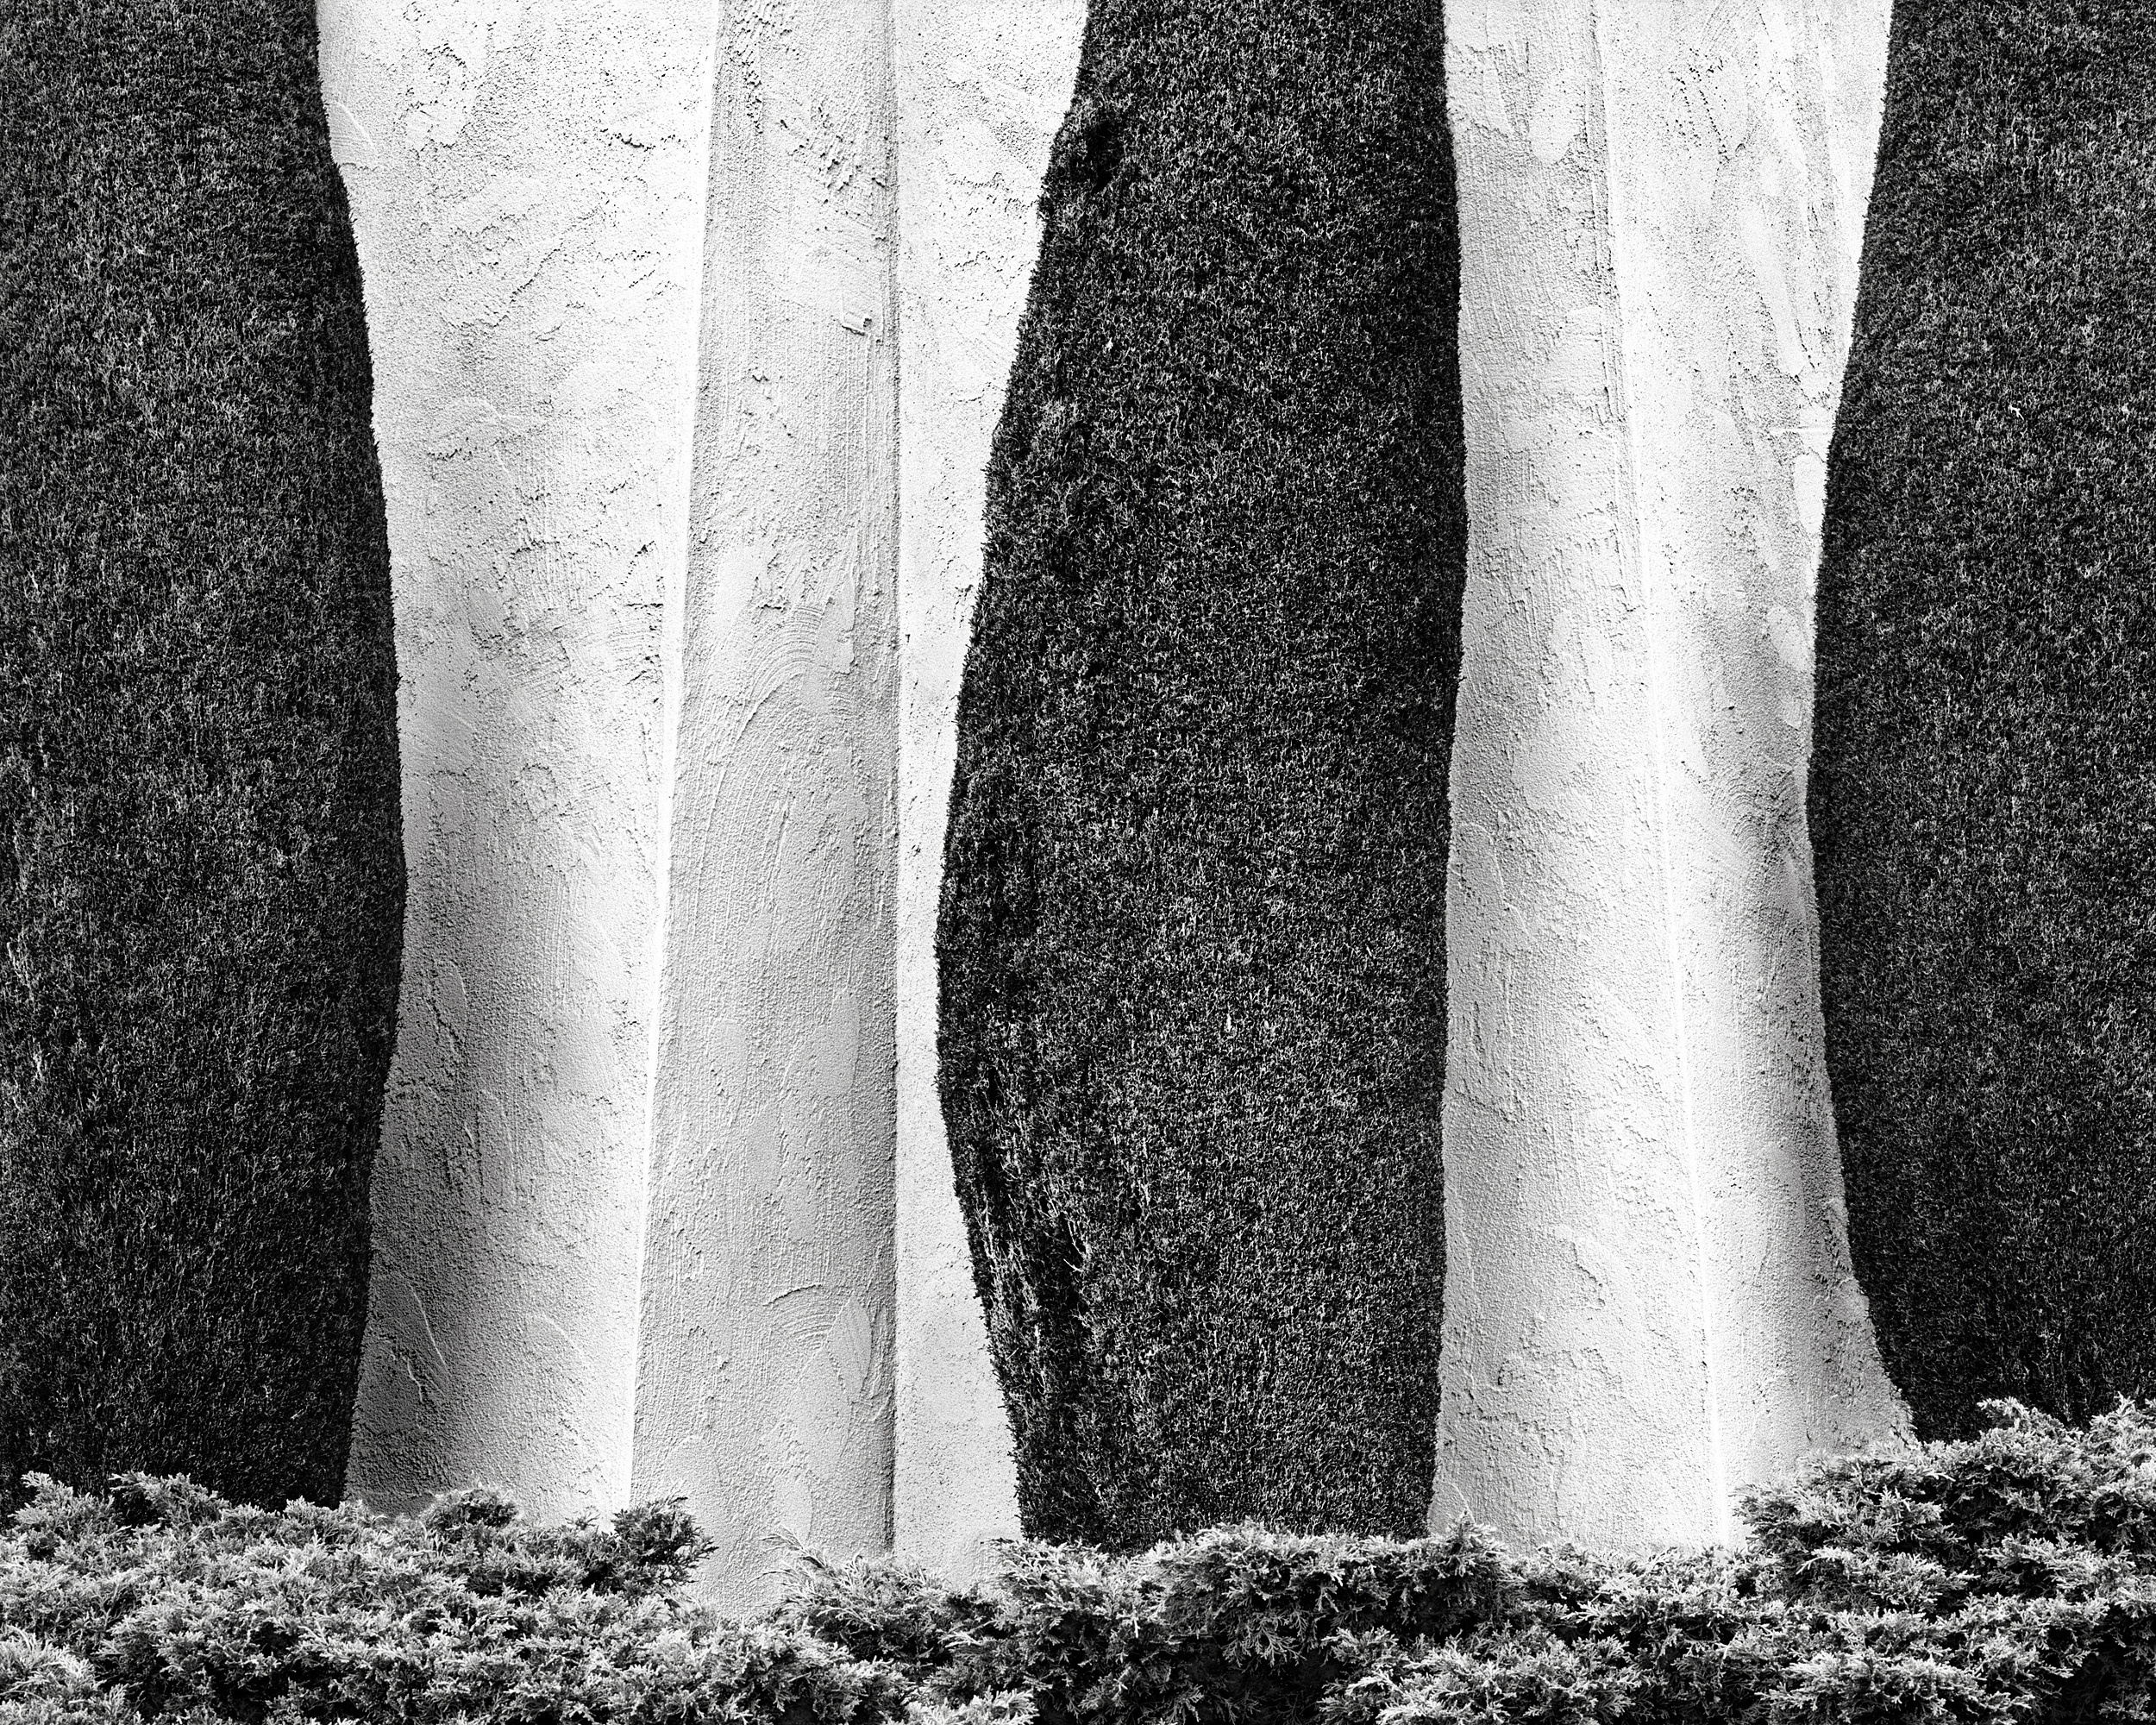 Cypress and Stucco, 1988